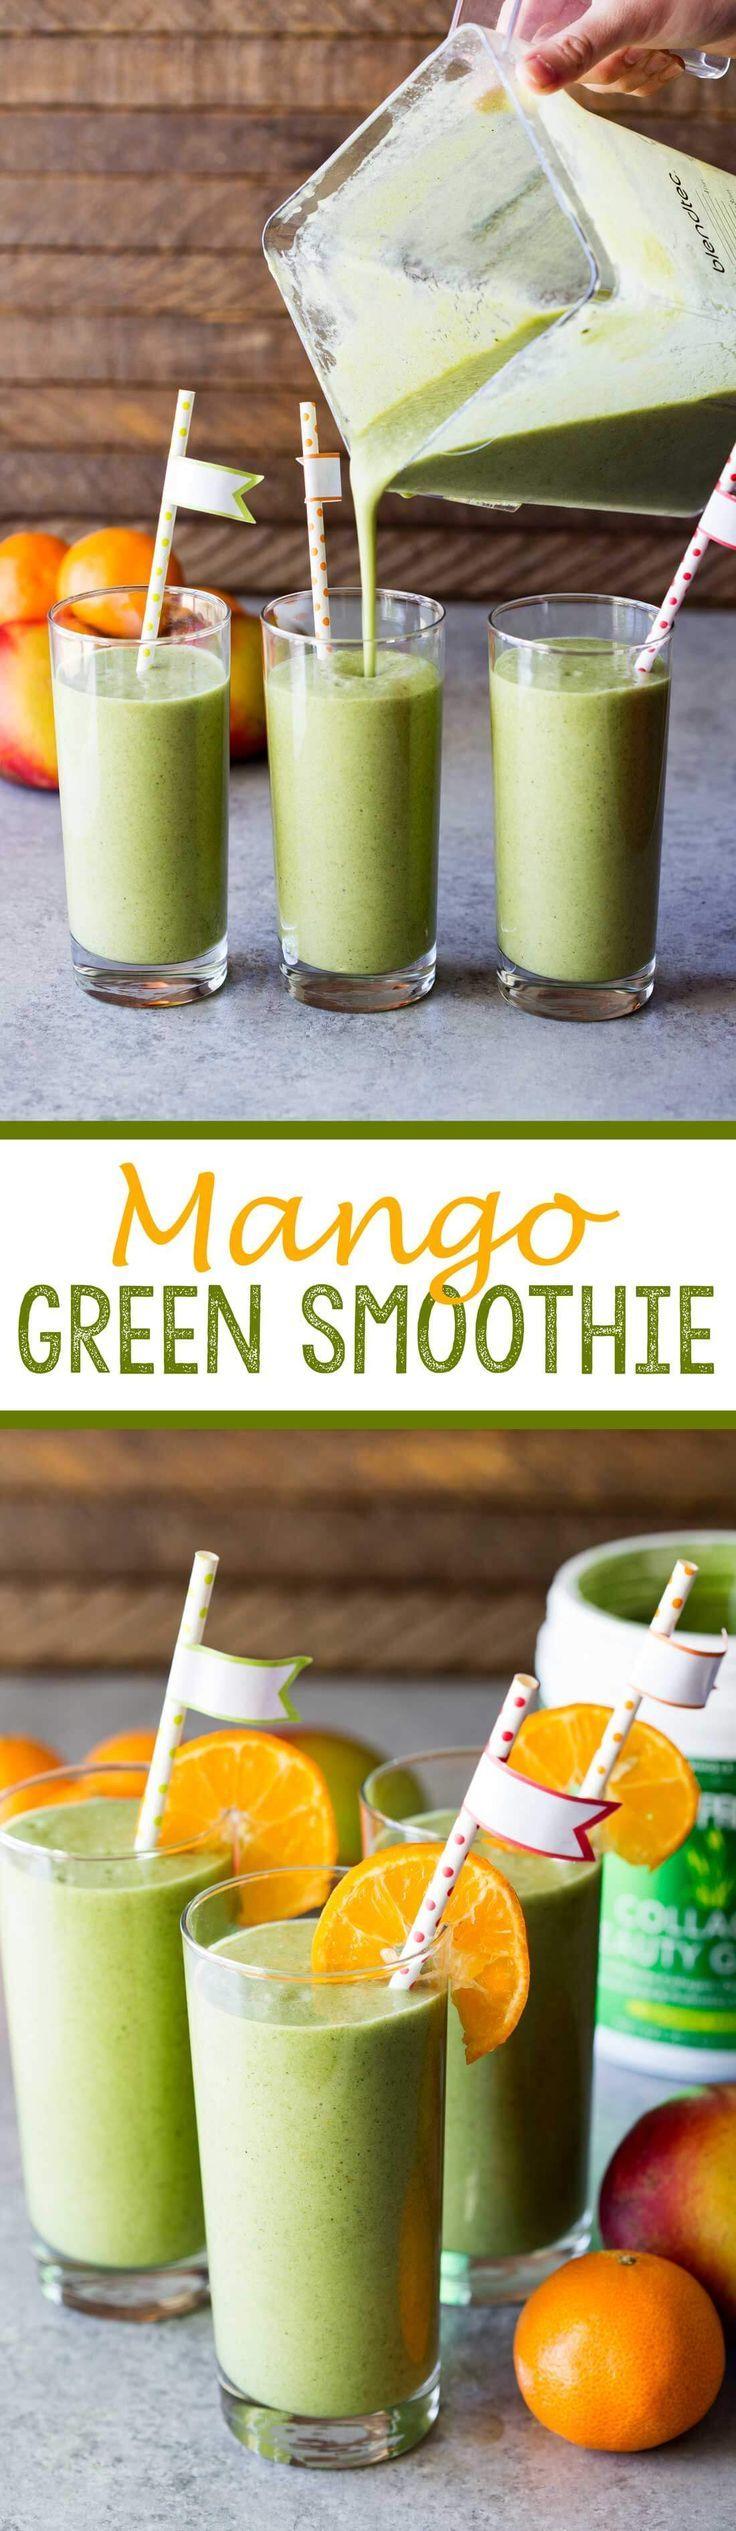 Mango Green Smoothie - Eazy Peazy Mealz